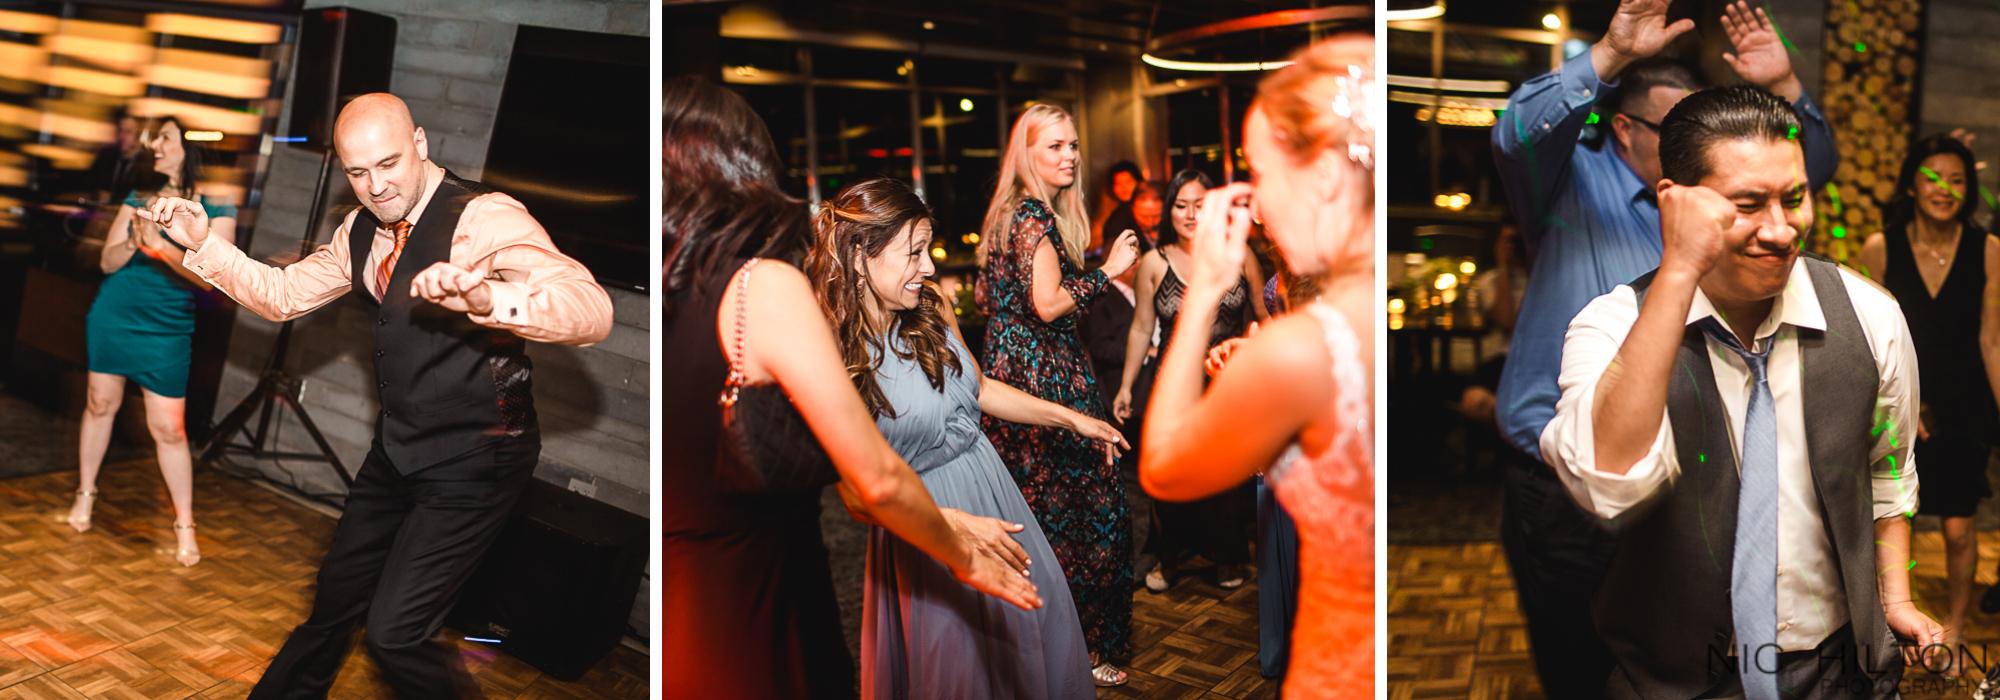 Mammoth-Dance-Photos-Wedding.jpg